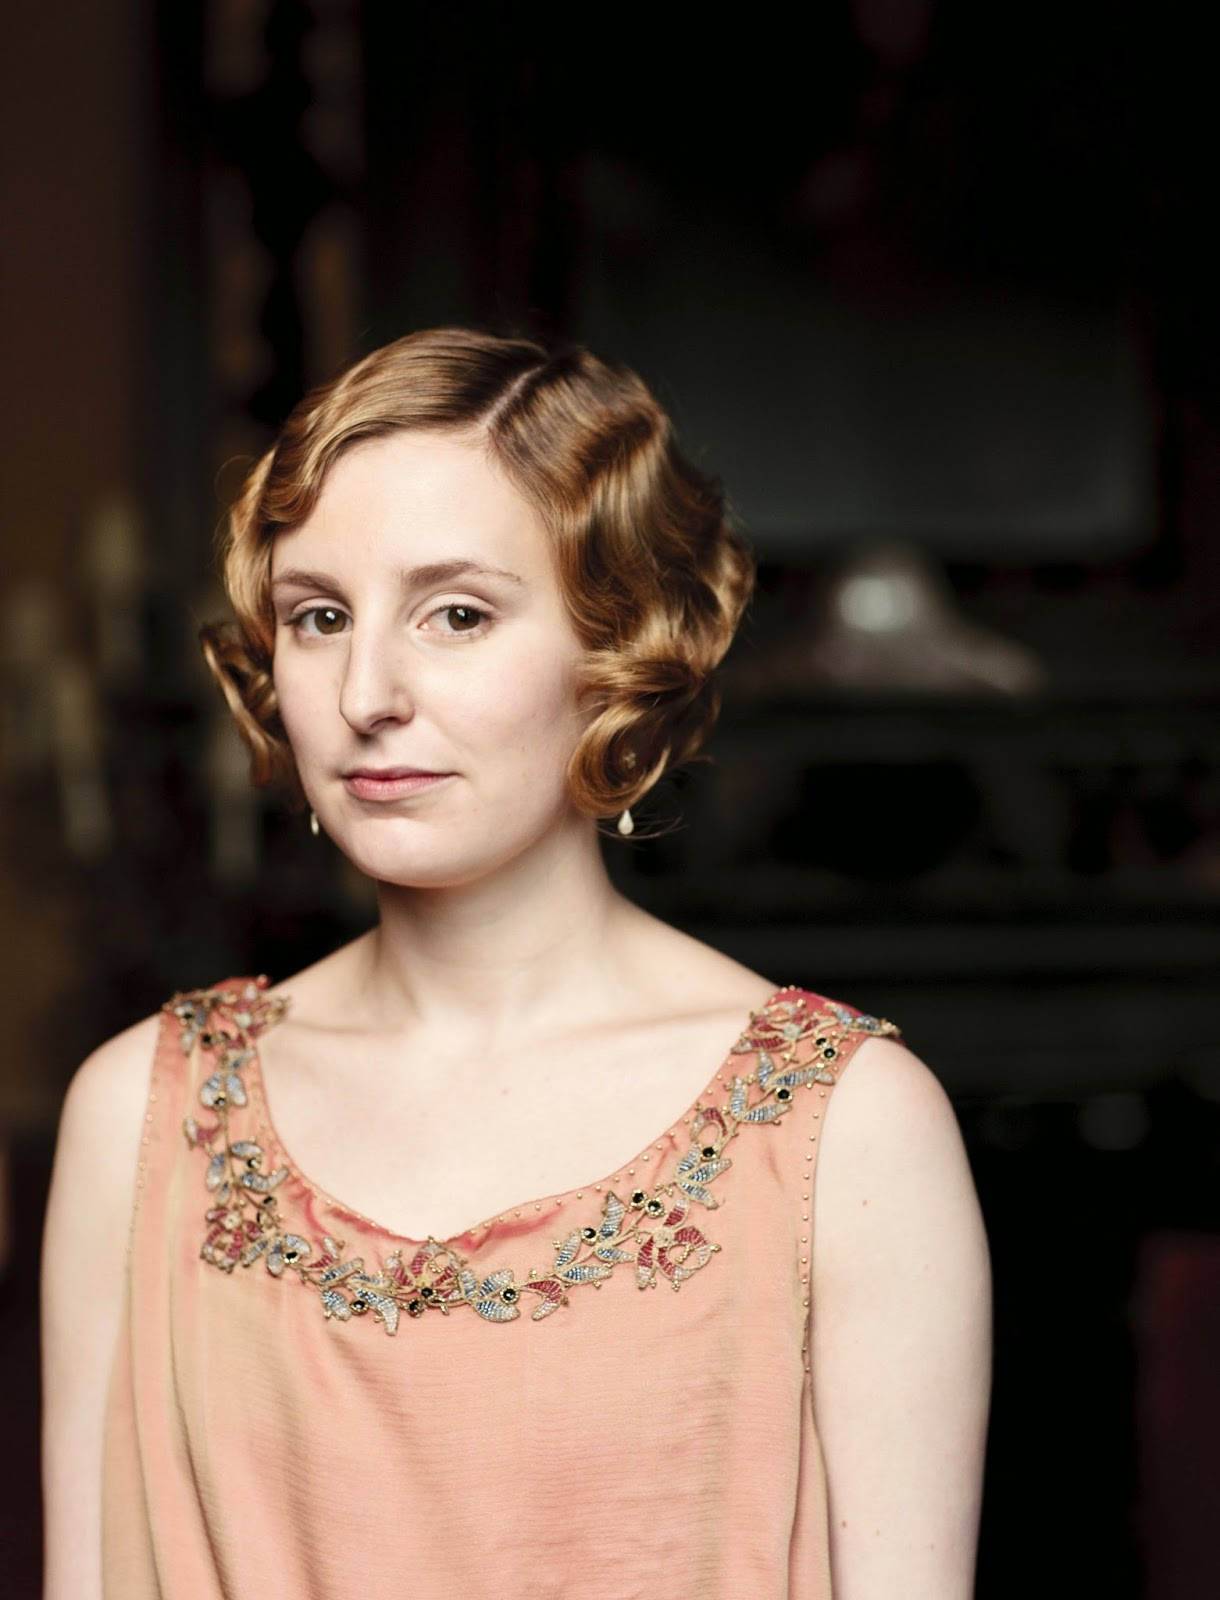 imgsrc siberian mouse 4: Women of Downton Abbey (Anna, Mary, Edith, Sybil, Mrs. Hughes, Violet  Crawley, Isobel Crawley)